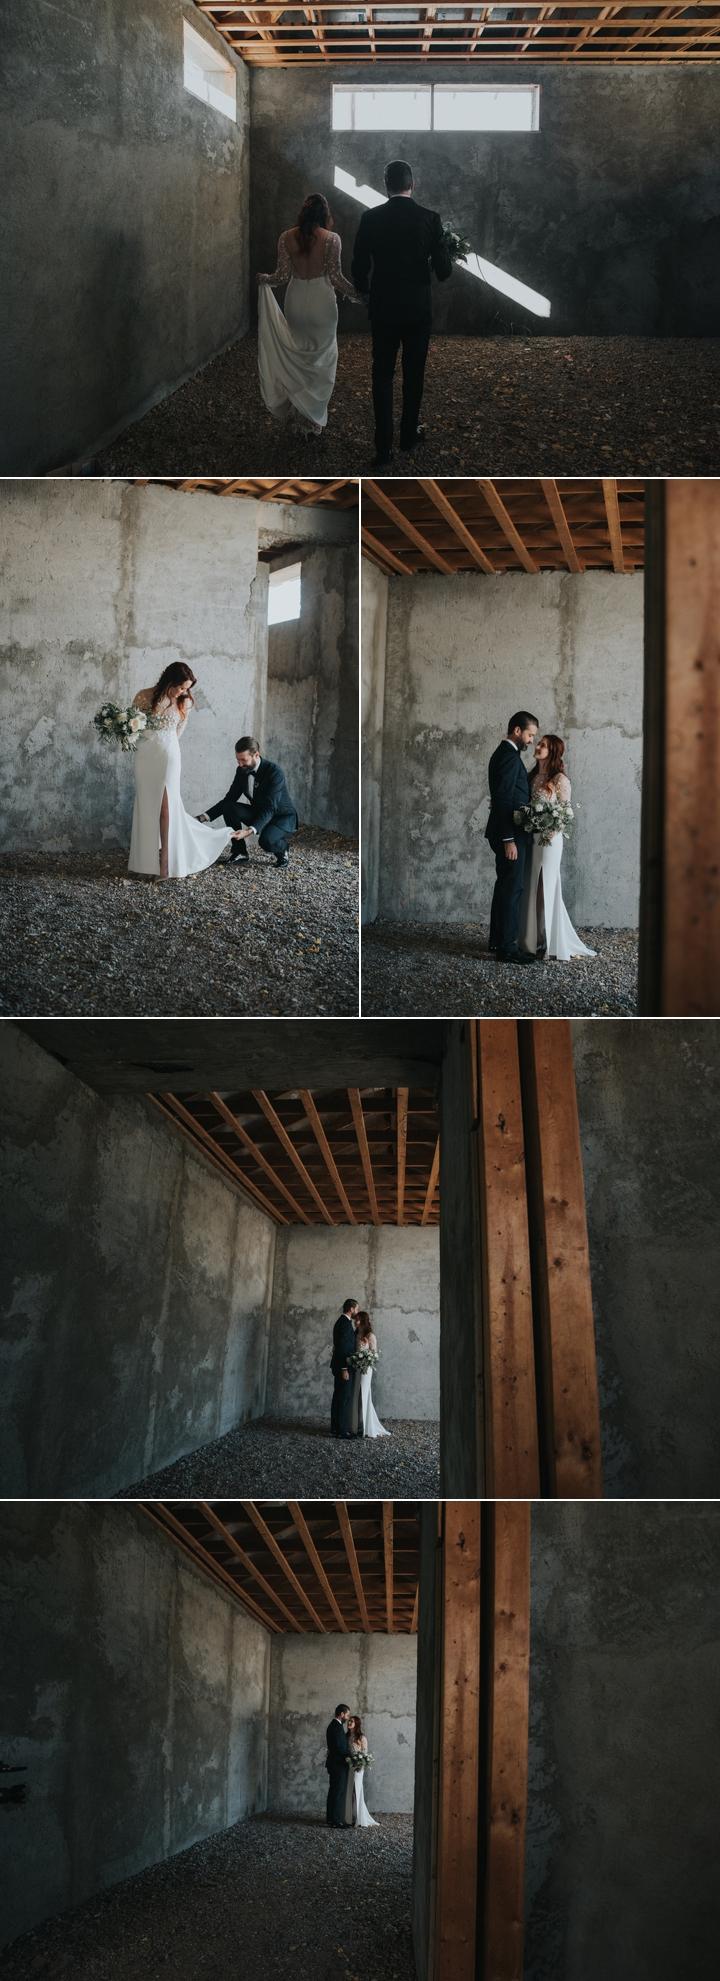 marfa-texas-weddings-photographers 23.jpg